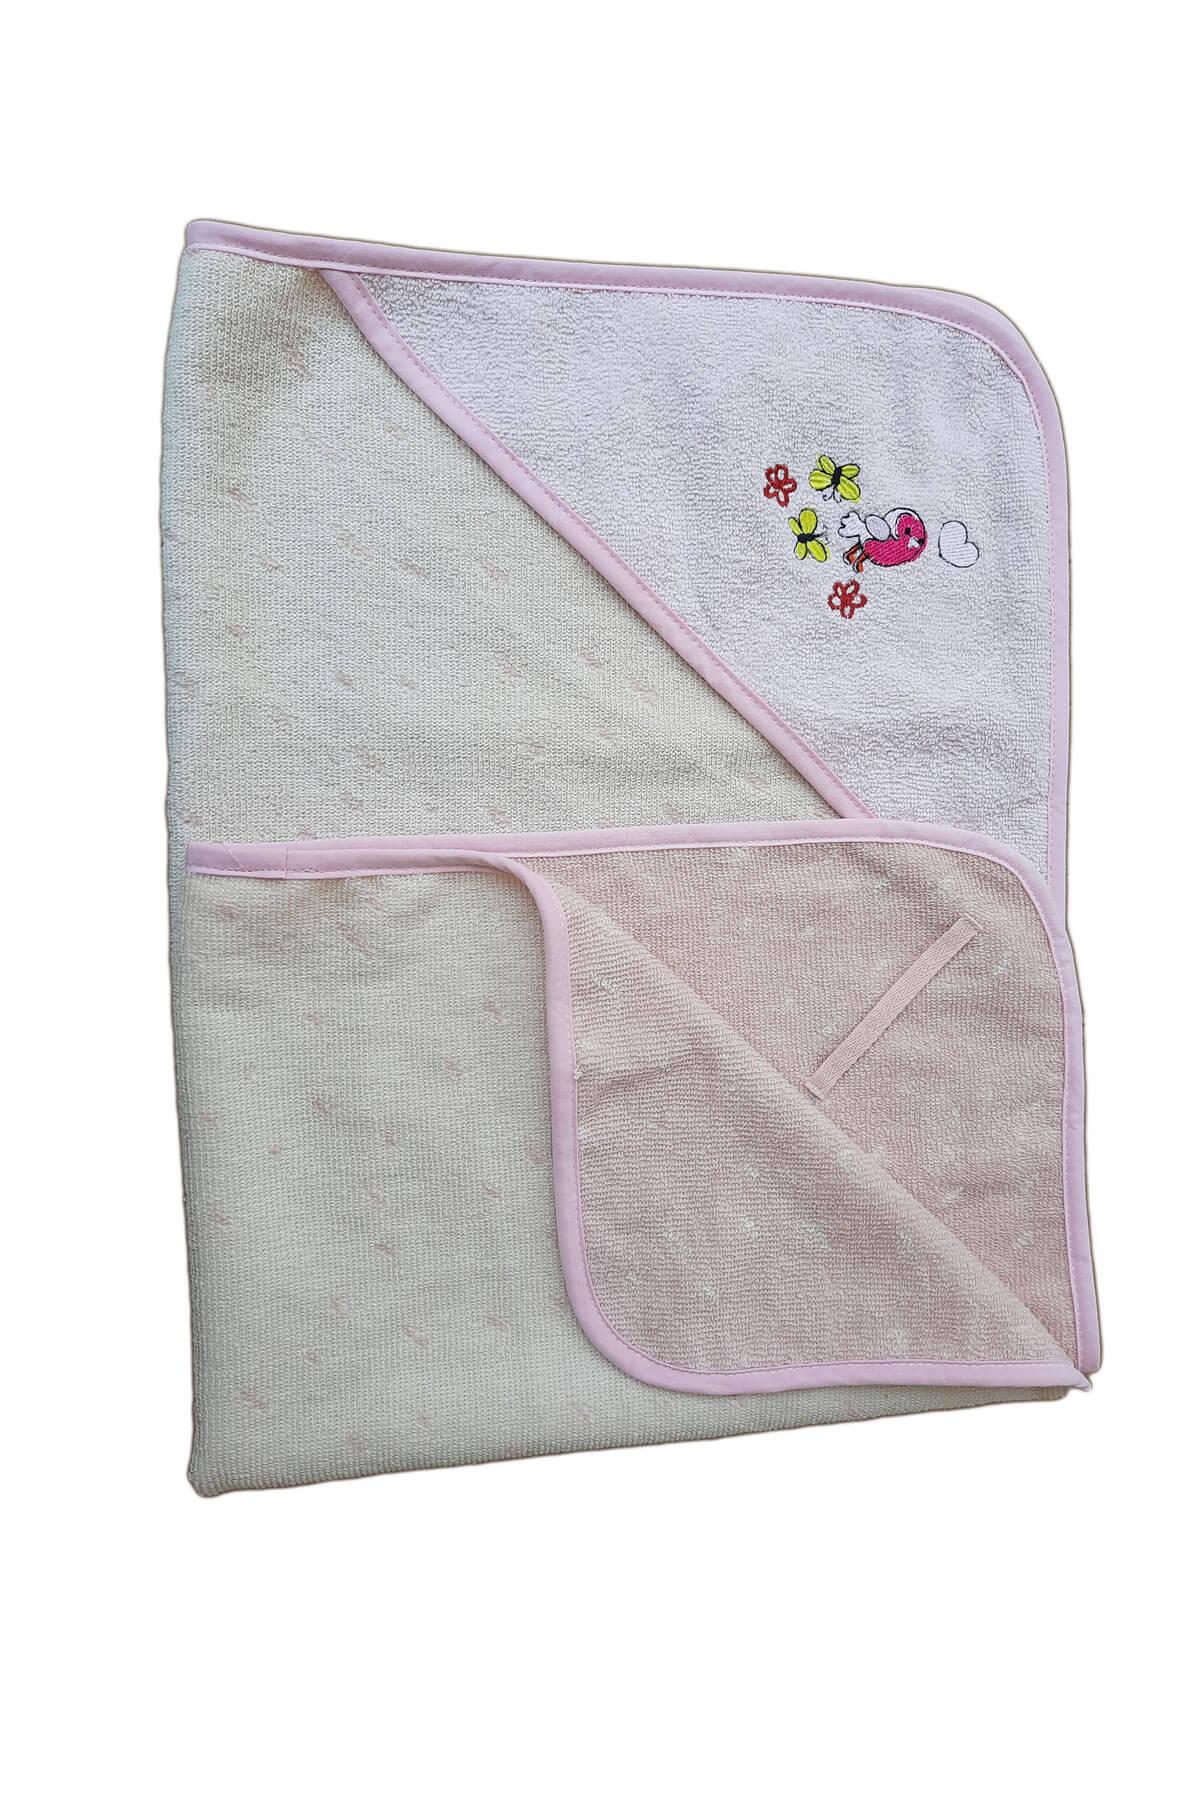 Kız Bebek Kundak Banyo Havlusu Pamuklu Bebek Havlusu 75x75